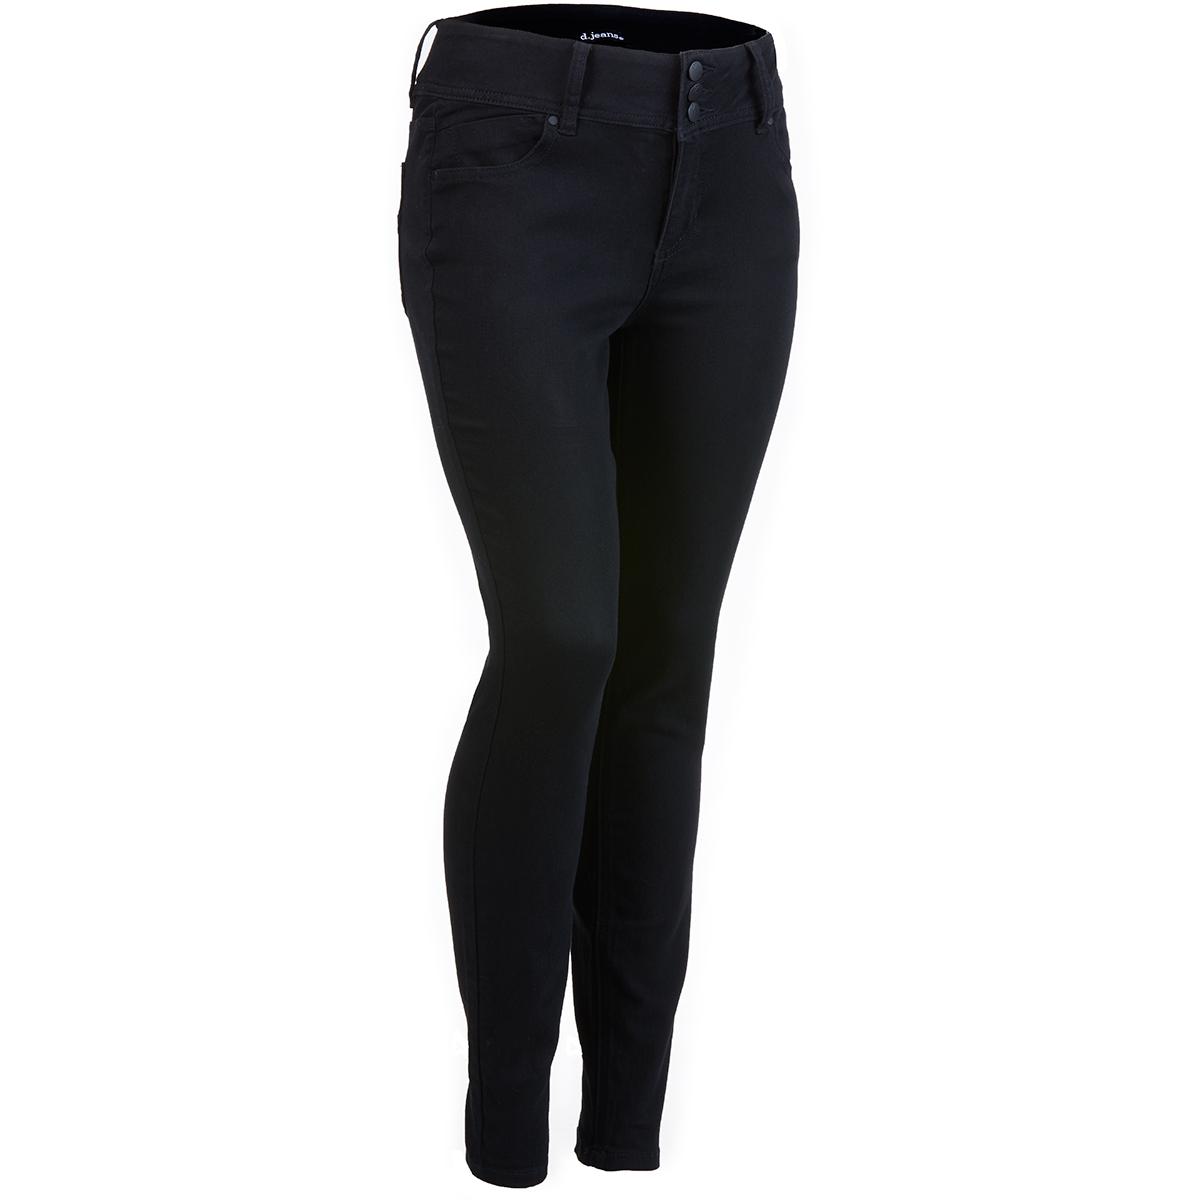 D Jeans Women's High Waist Triple Button Skinny Jeans - Black, 10